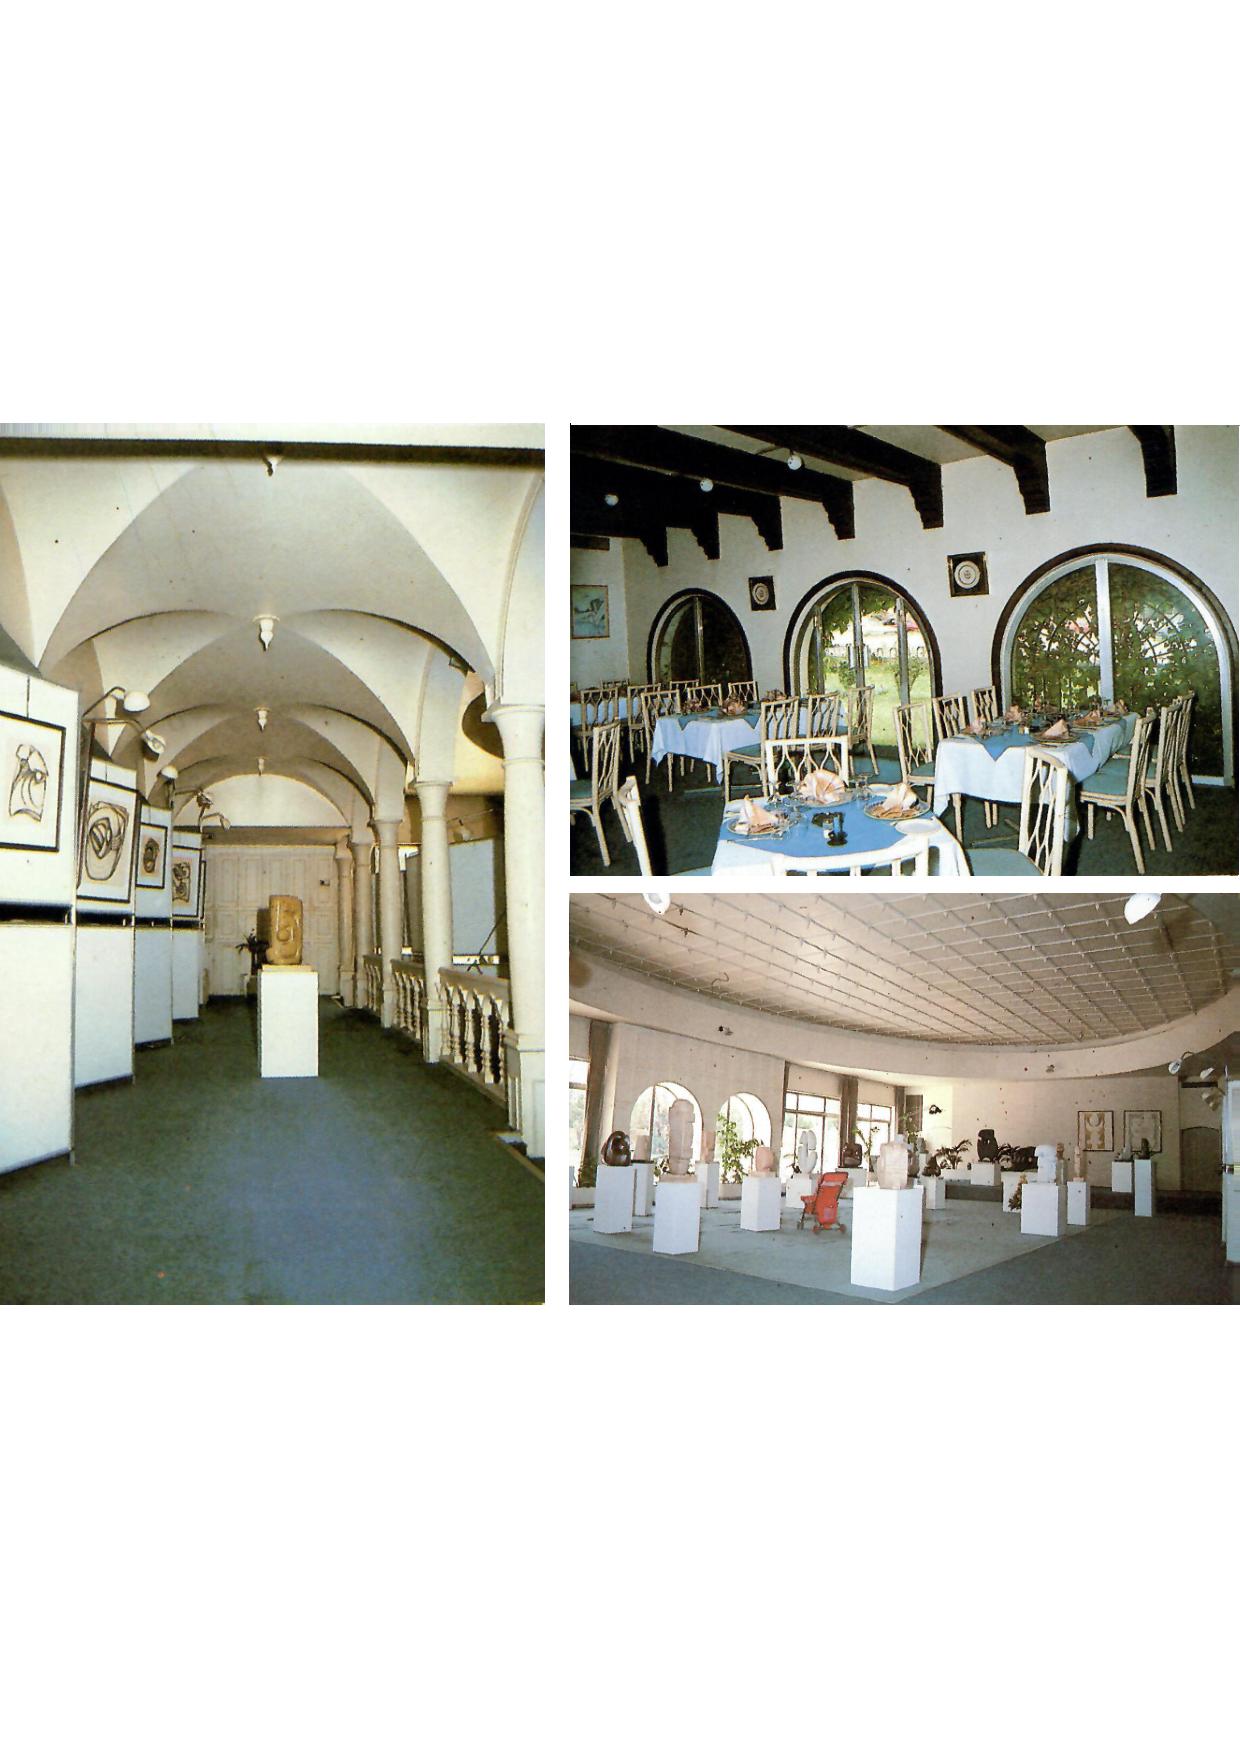 Interior photos of the building. .صور لداخل البناء